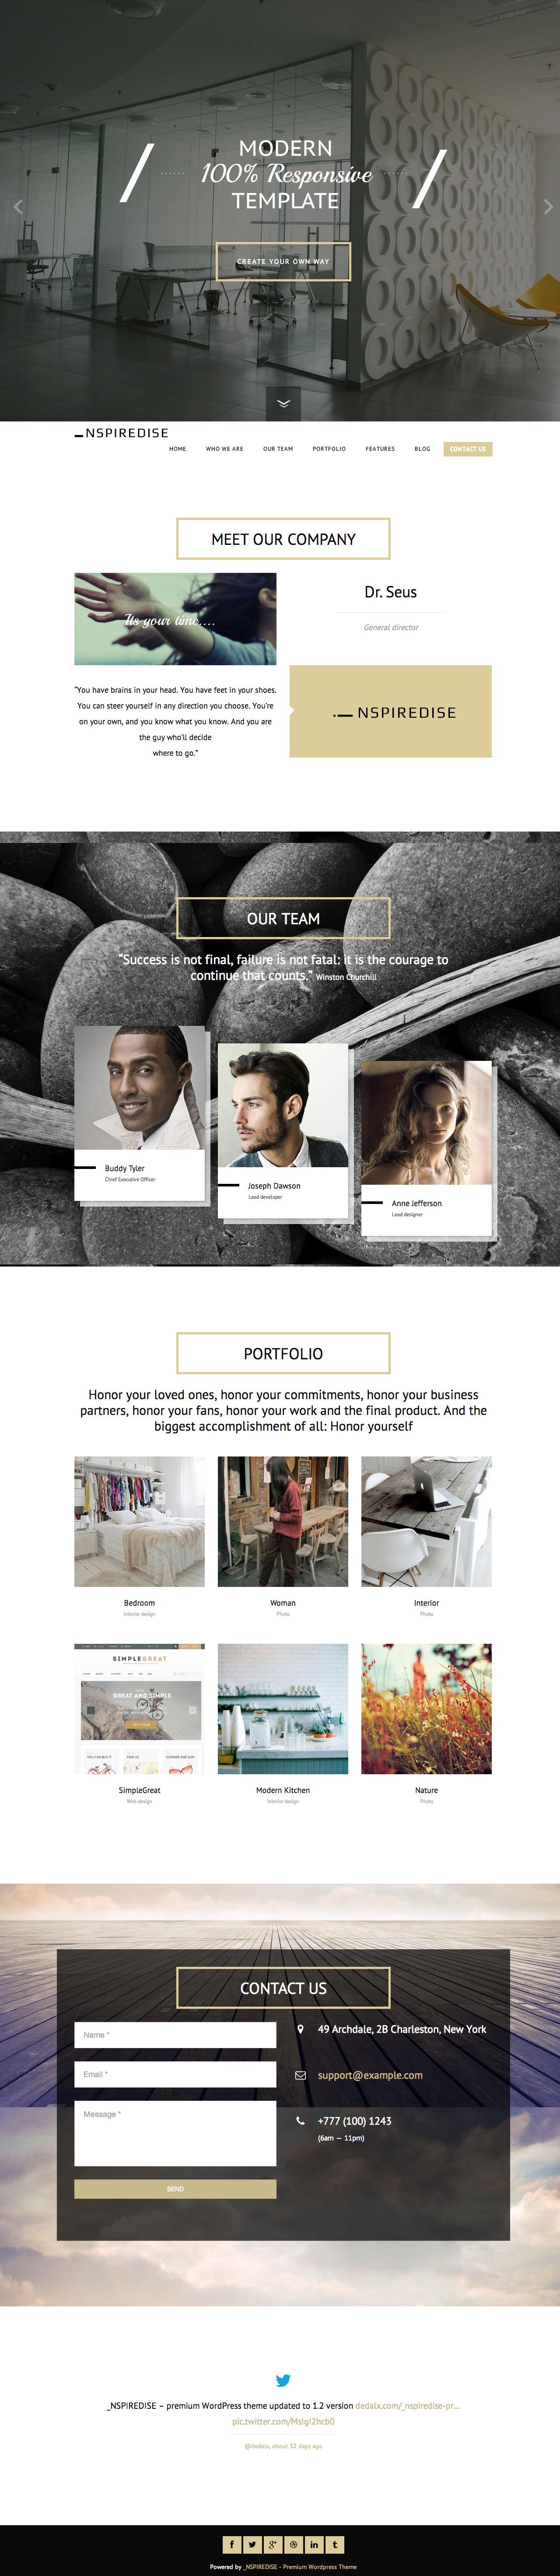 Nspired Website Screenshot